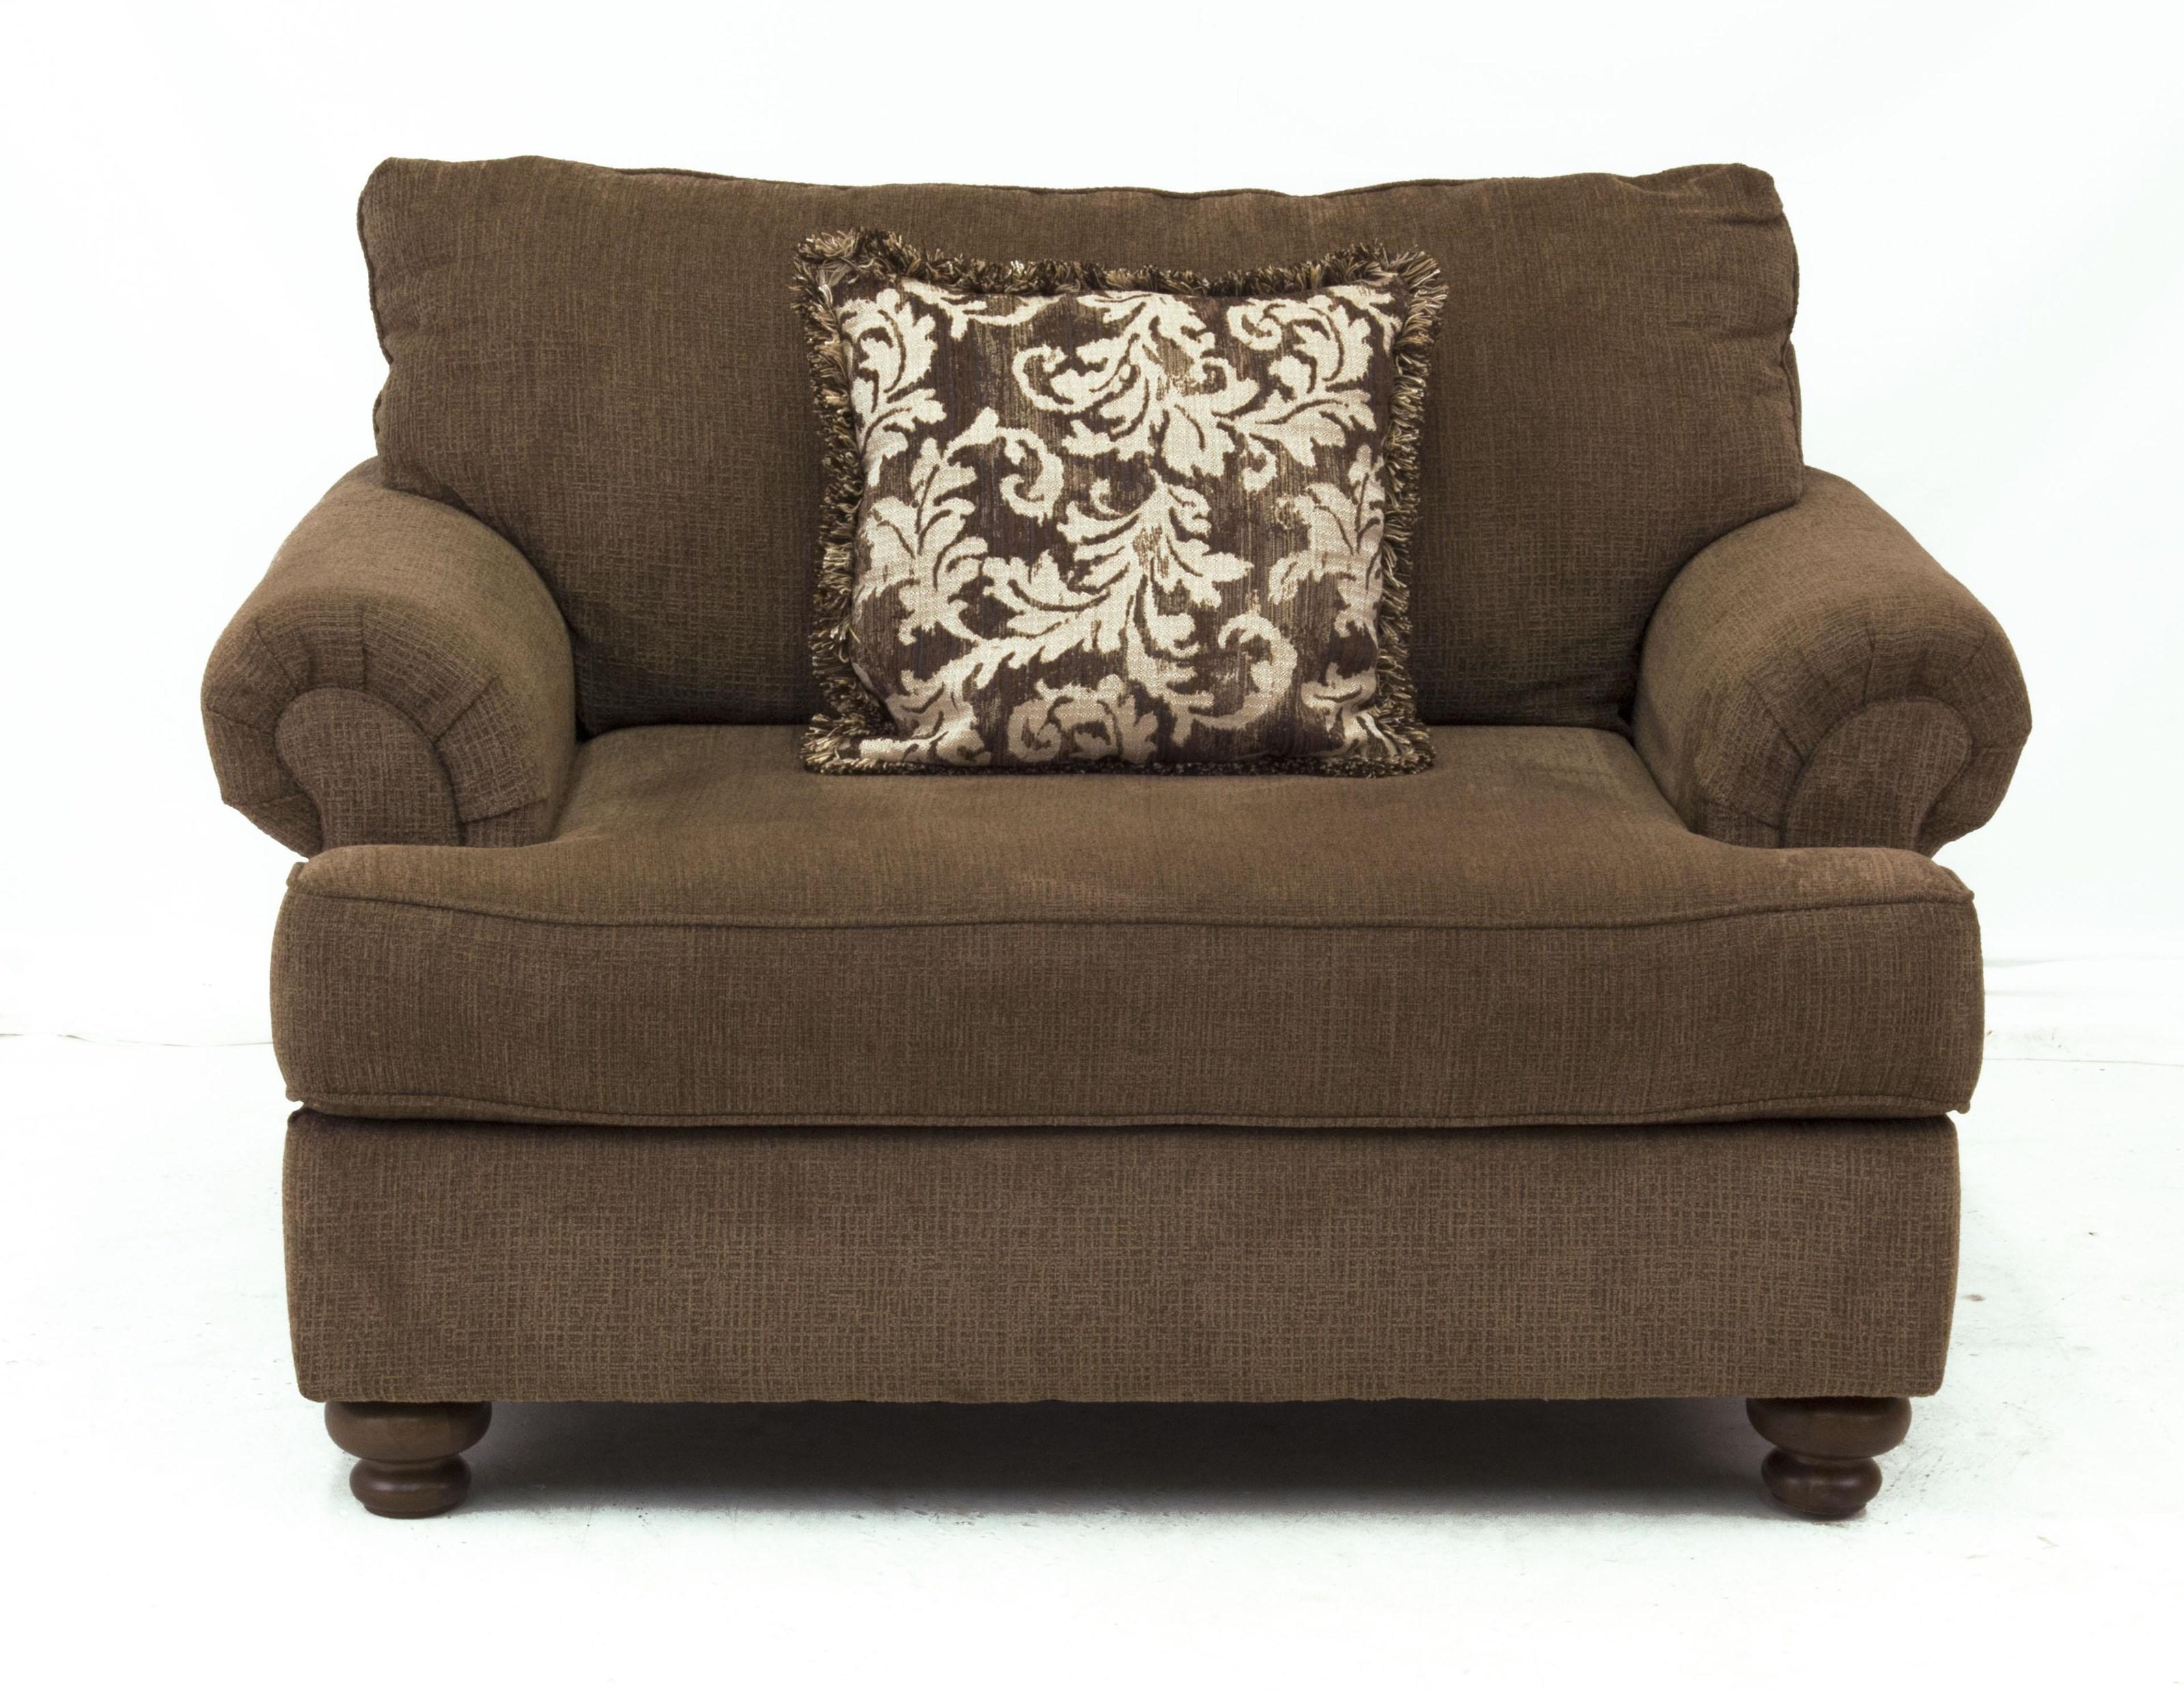 Metropia Gannon Traditional Big Chair - Item Number: 167350-C